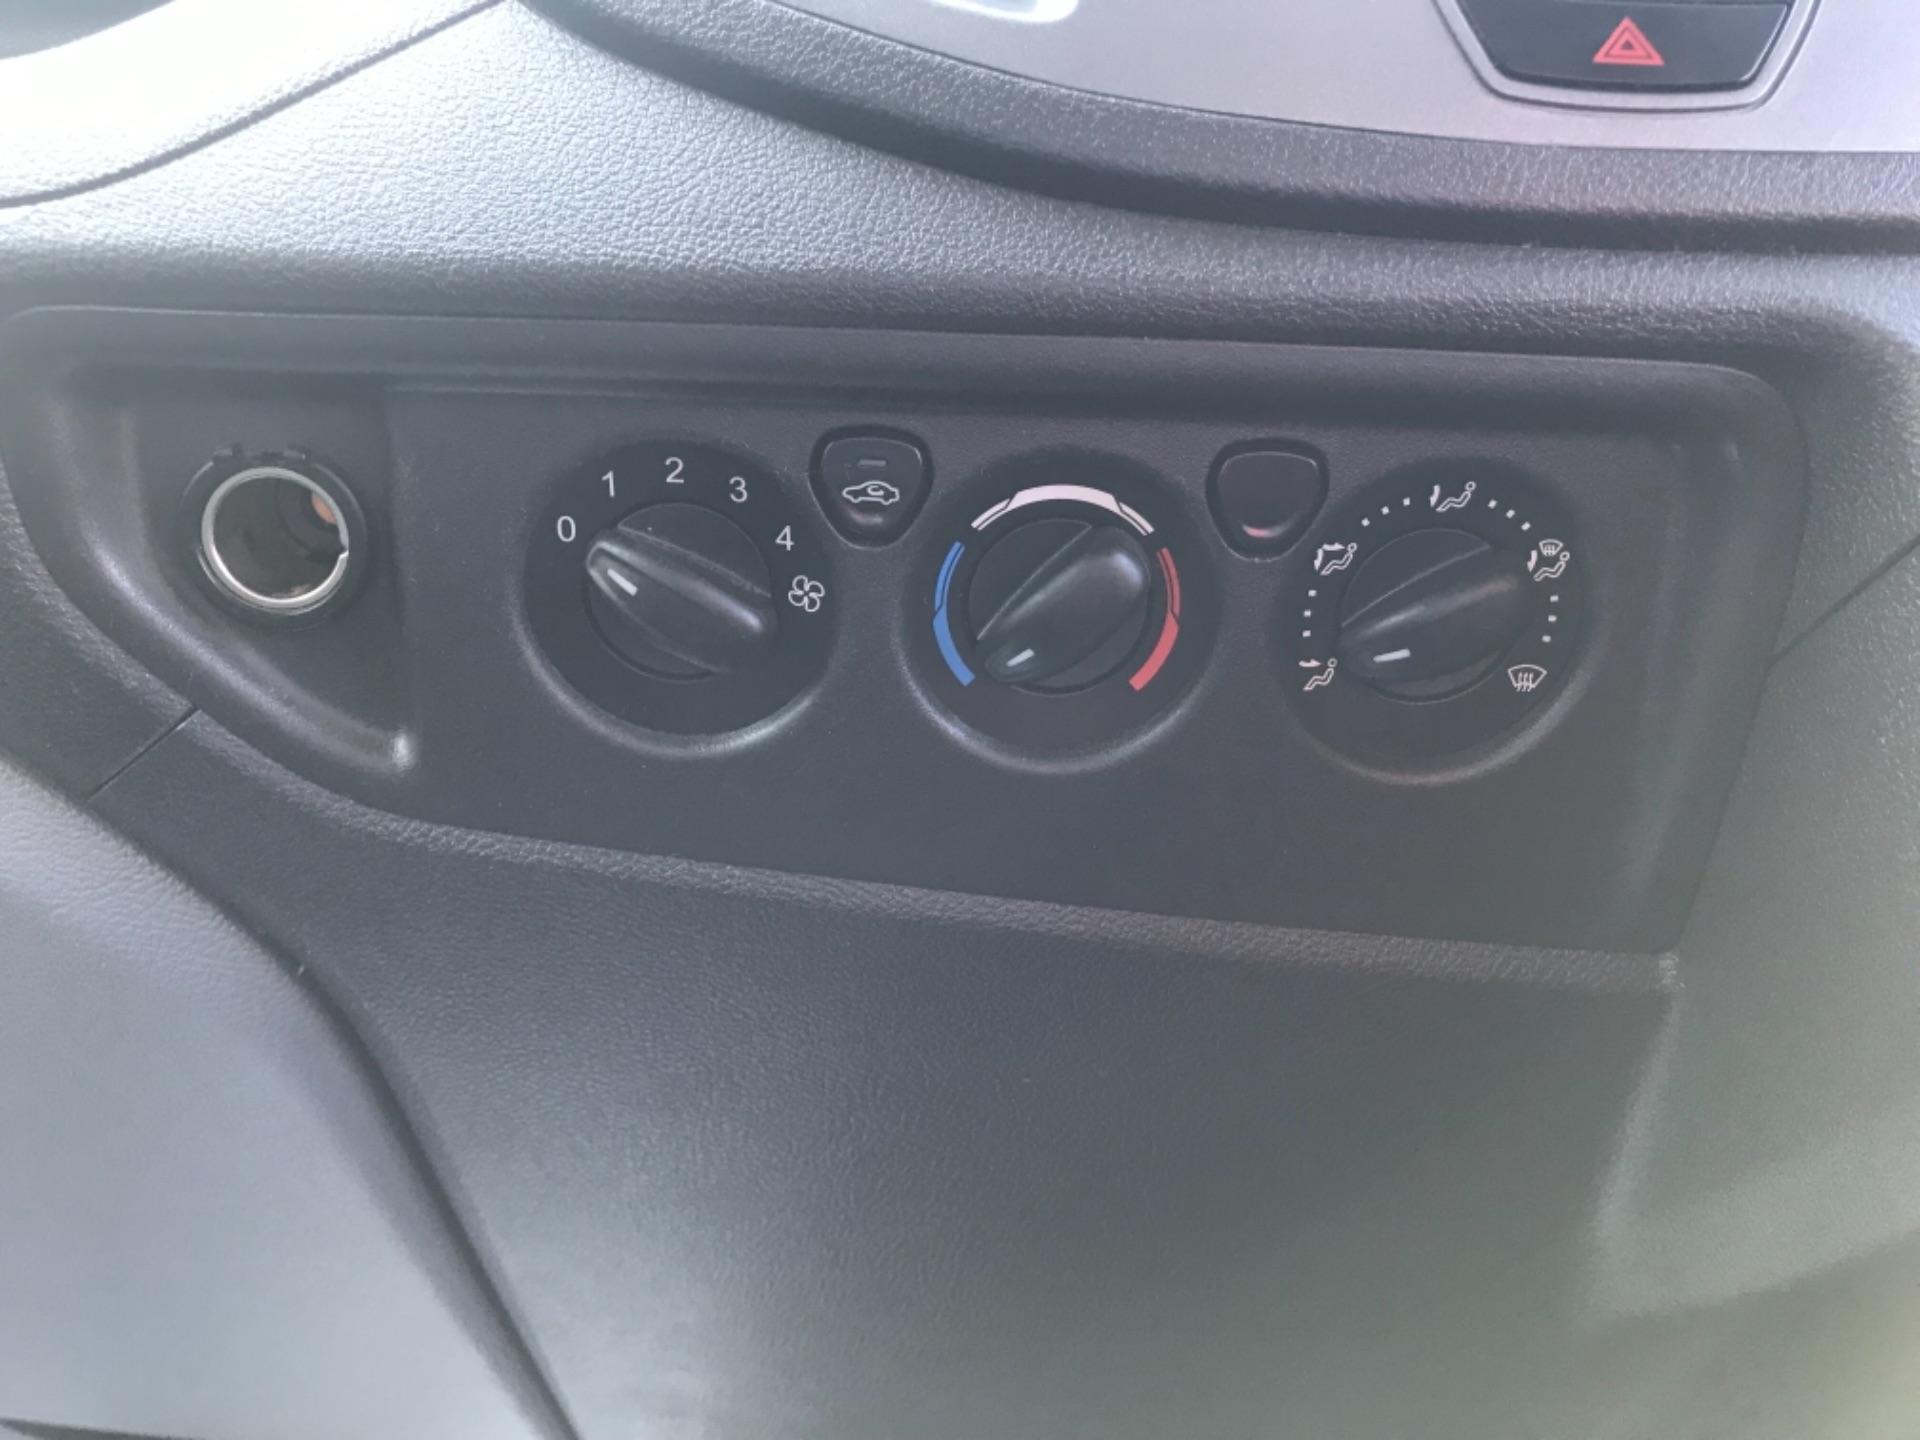 2016 Ford Transit 2.2 Tdci 125Ps Dropside DRW Tail lift (YS66SNU) Image 20